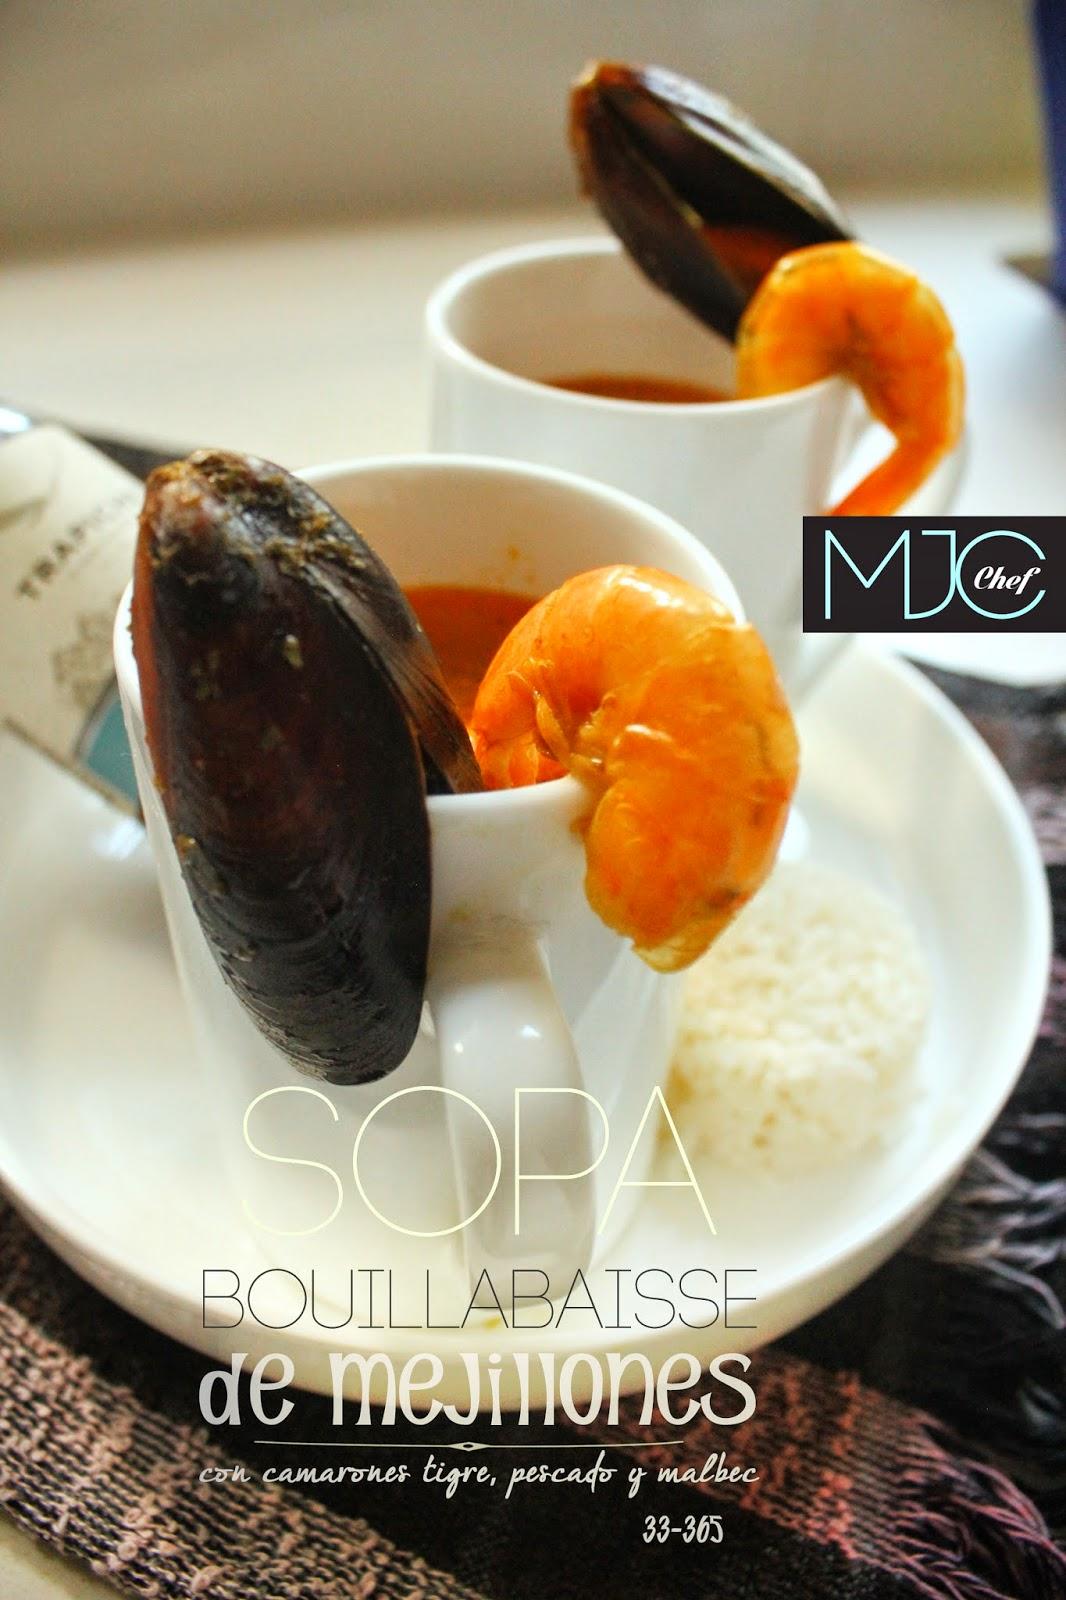 Sopa Bouillabaisse